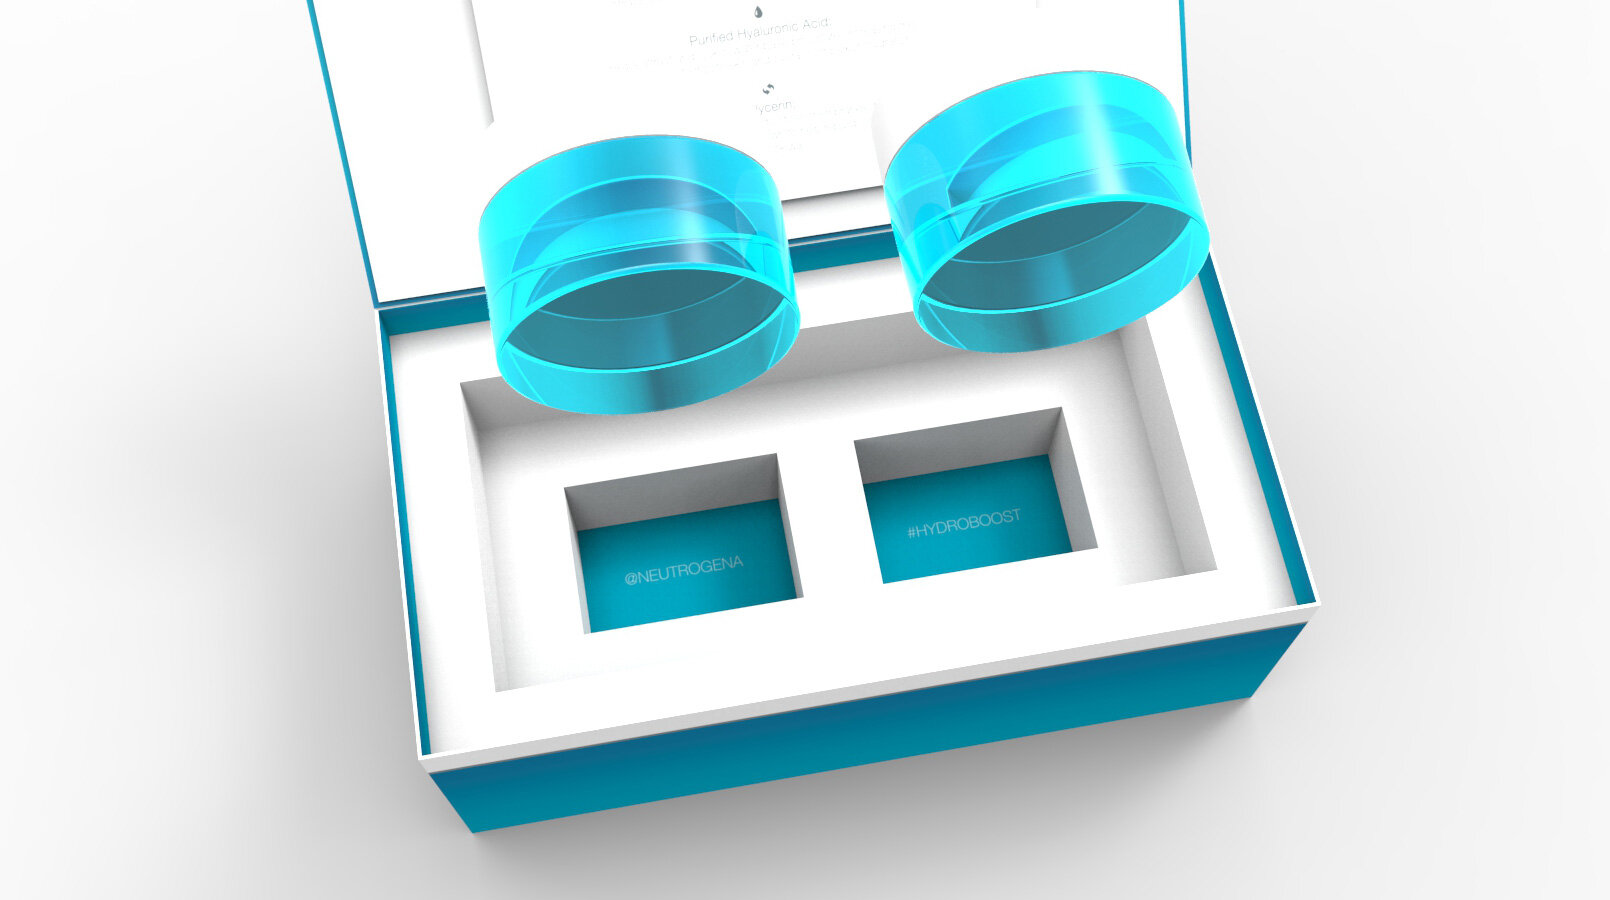 Nueverogena-Hydro-Boost-Box-化妆品包装公司 - 设计-4.JPG